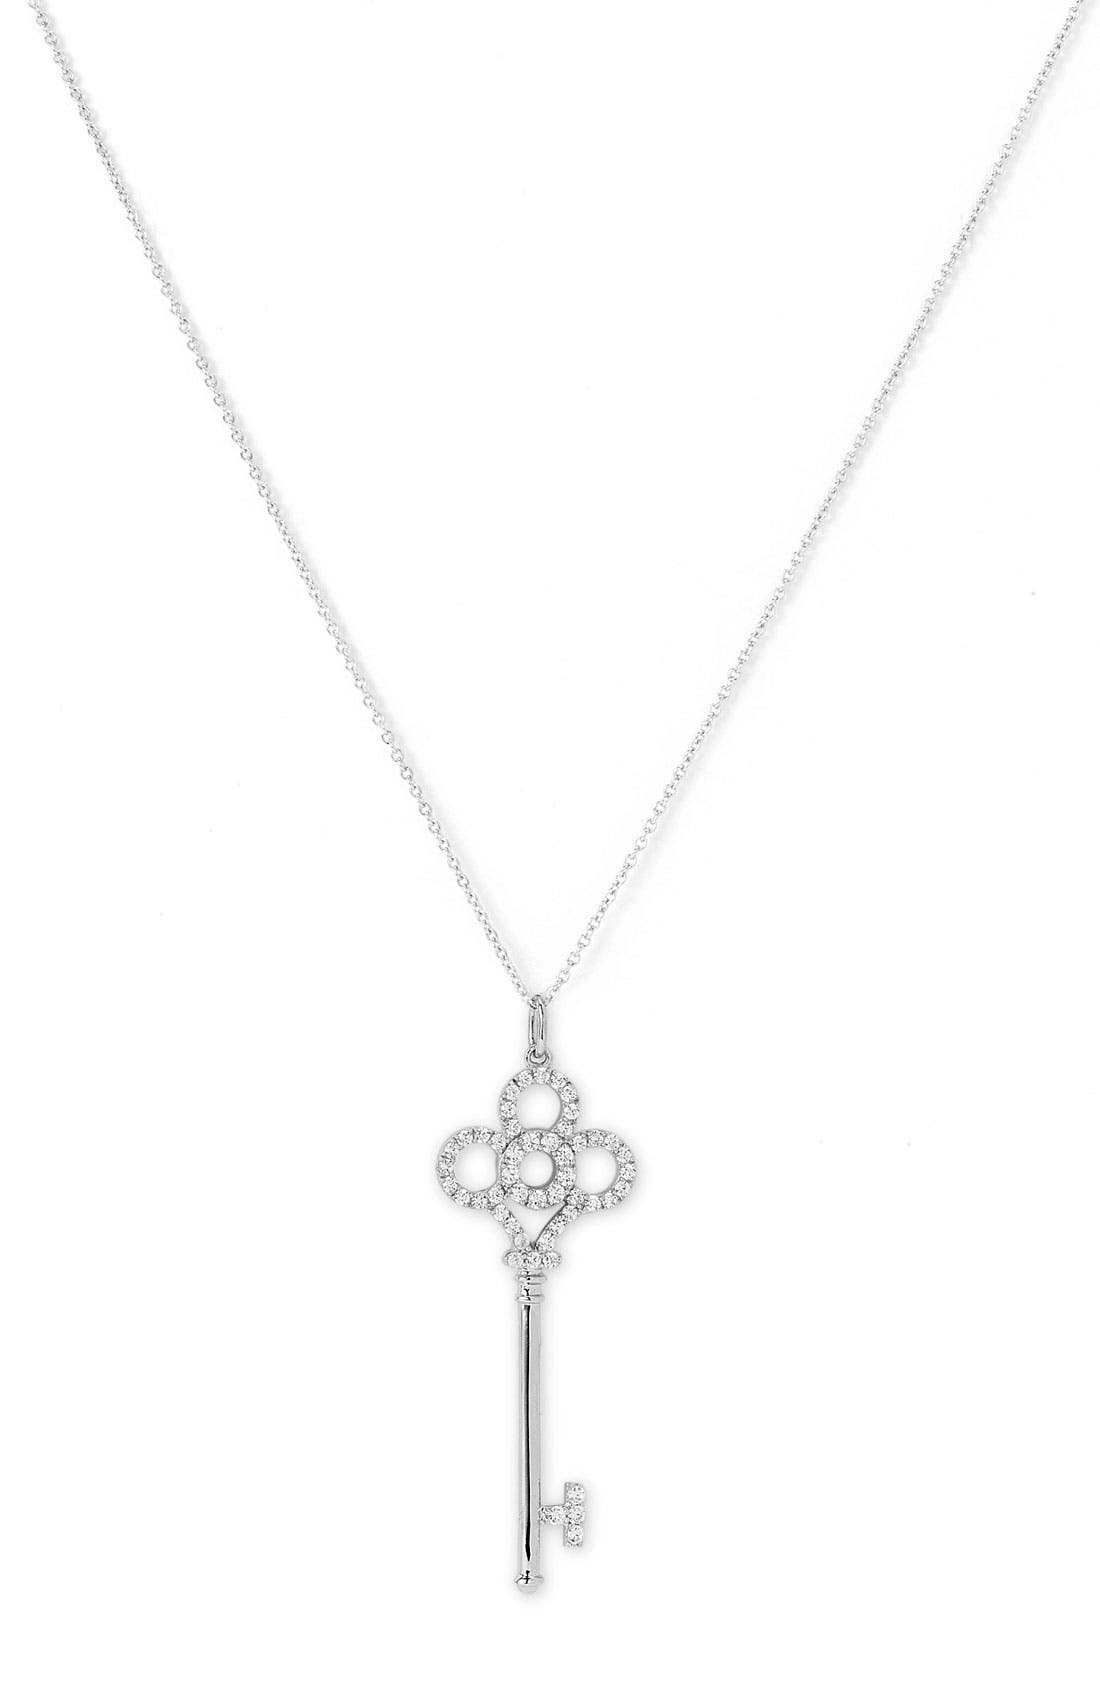 Alternate Image 1 Selected - Nordstrom Key Pendant Necklace